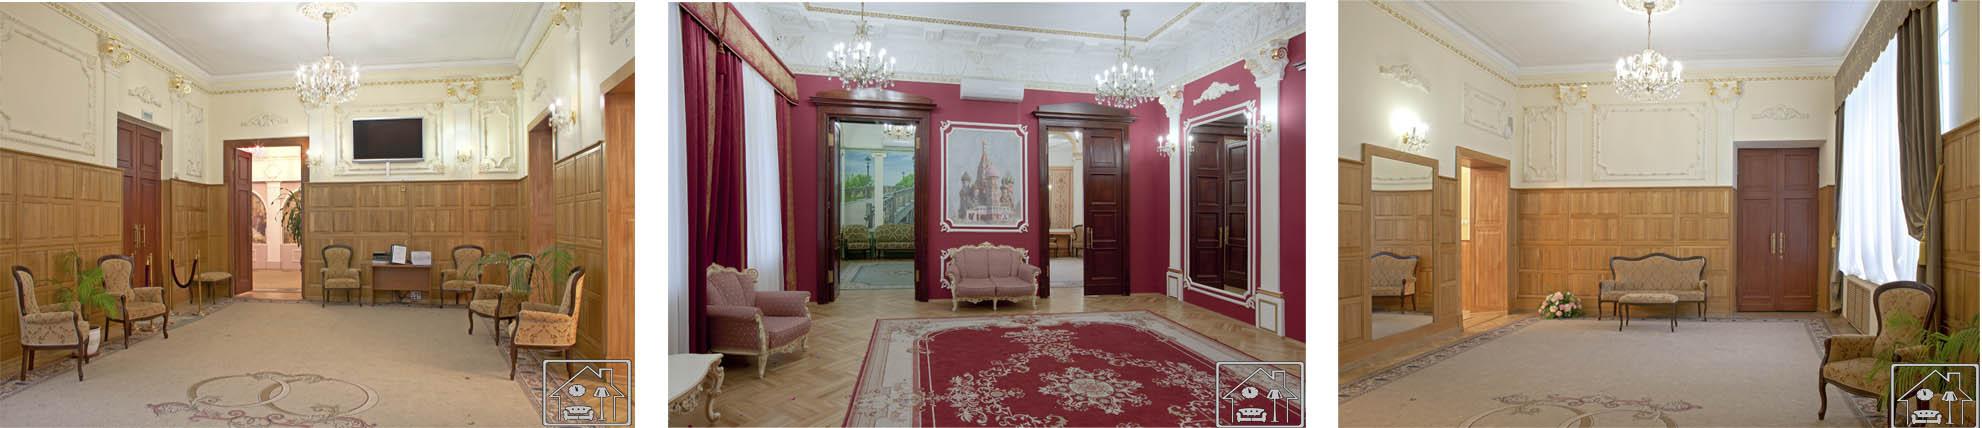 Грибоедоский ЗАГС холл,трафаретный рисунок на стенах,фрески, ручная позолота колонн и лепного декора